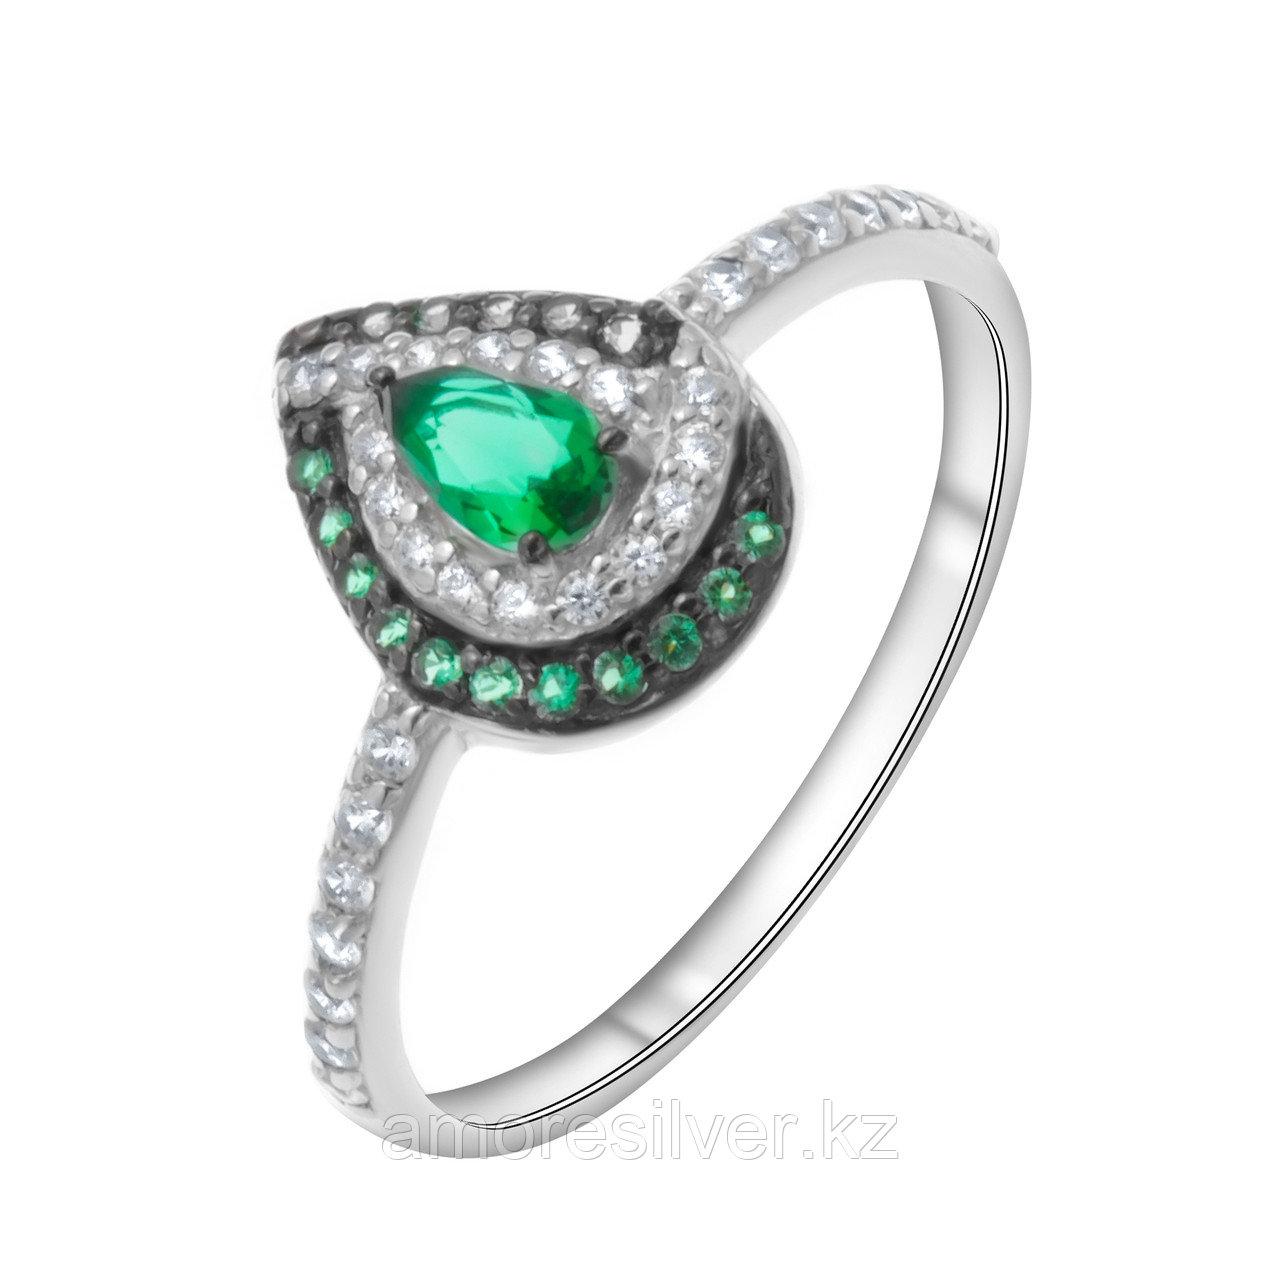 "Кольцо TEOSA серебро с родием, кварц синт., ""halo"" 1101047-04045 размеры - 17,5"